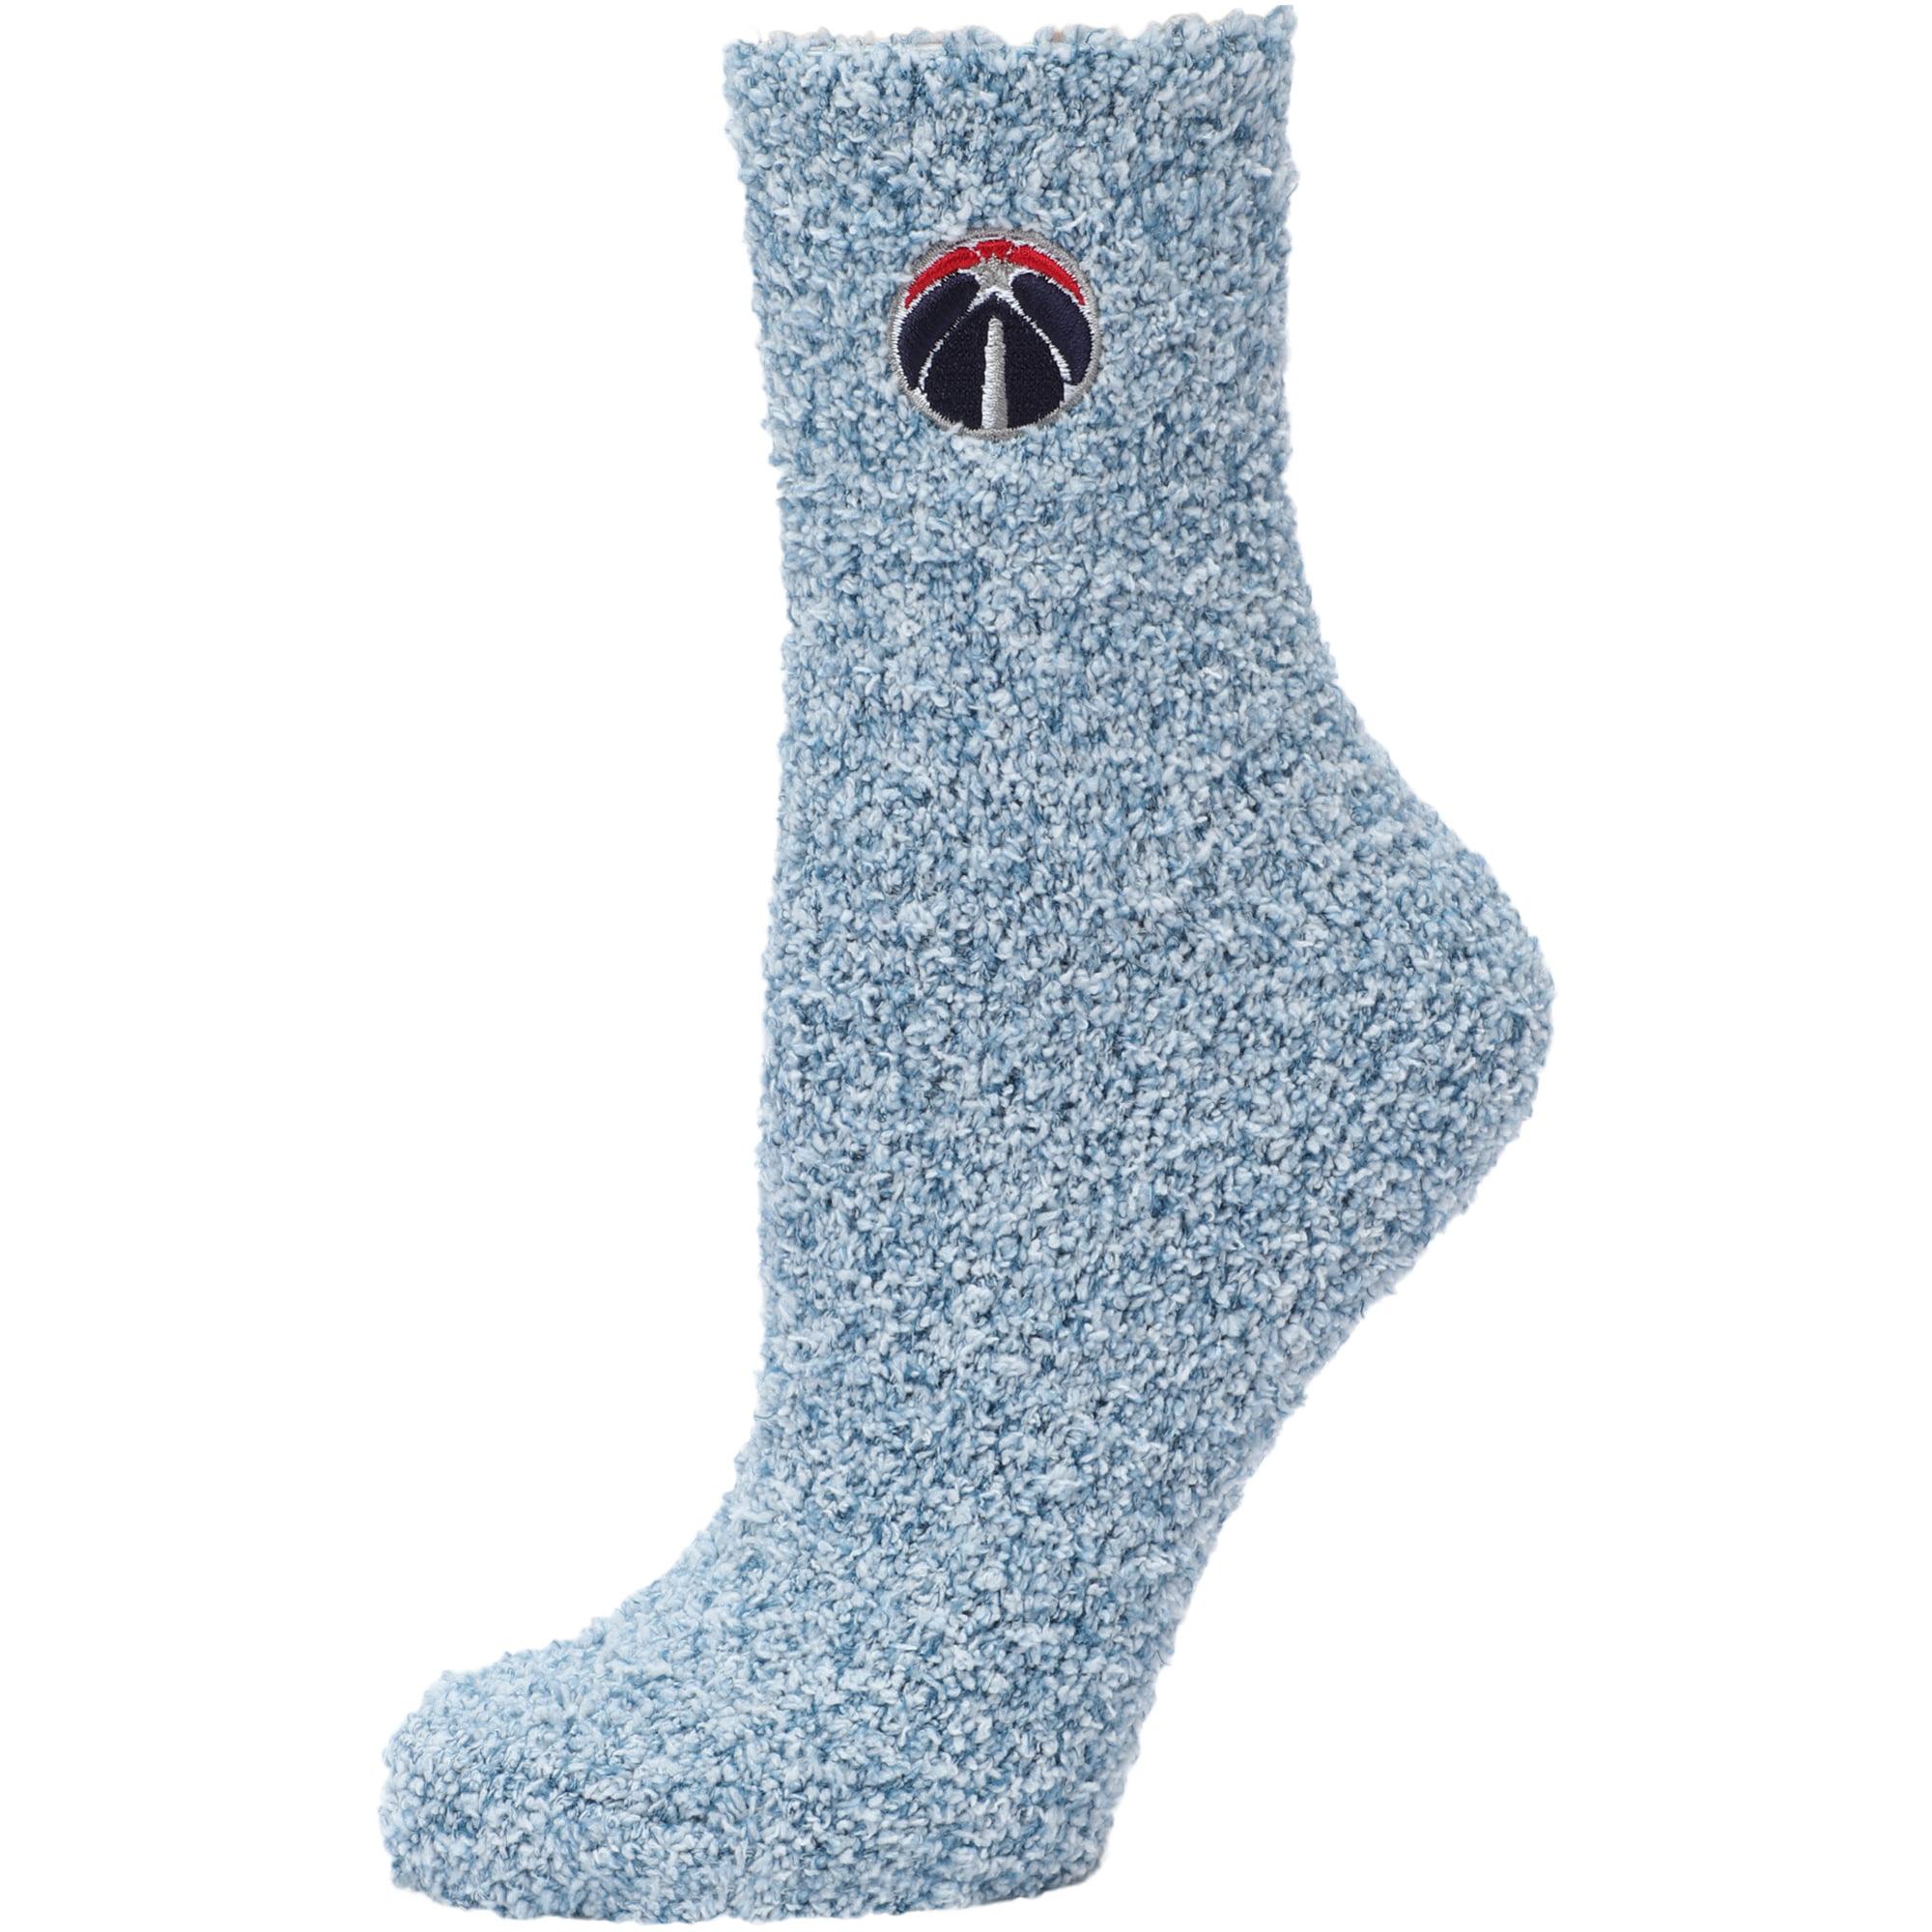 Washington Wizards Women's Fuzzy Block Tri-Blend Socks - Navy - M